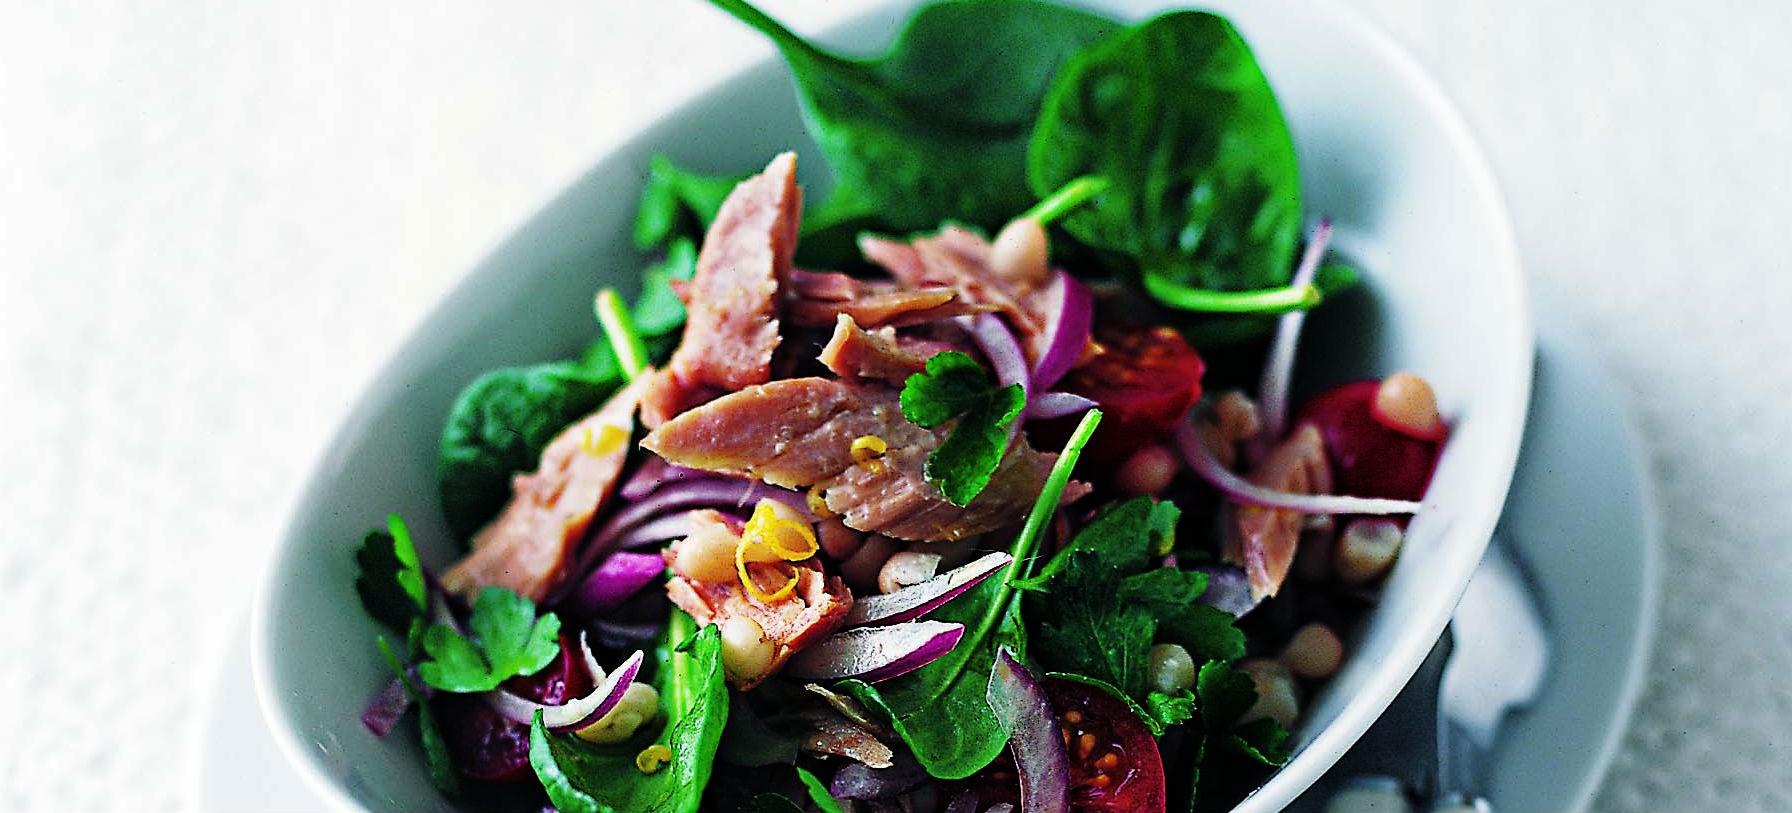 Tuna, cannellini and spinach salad